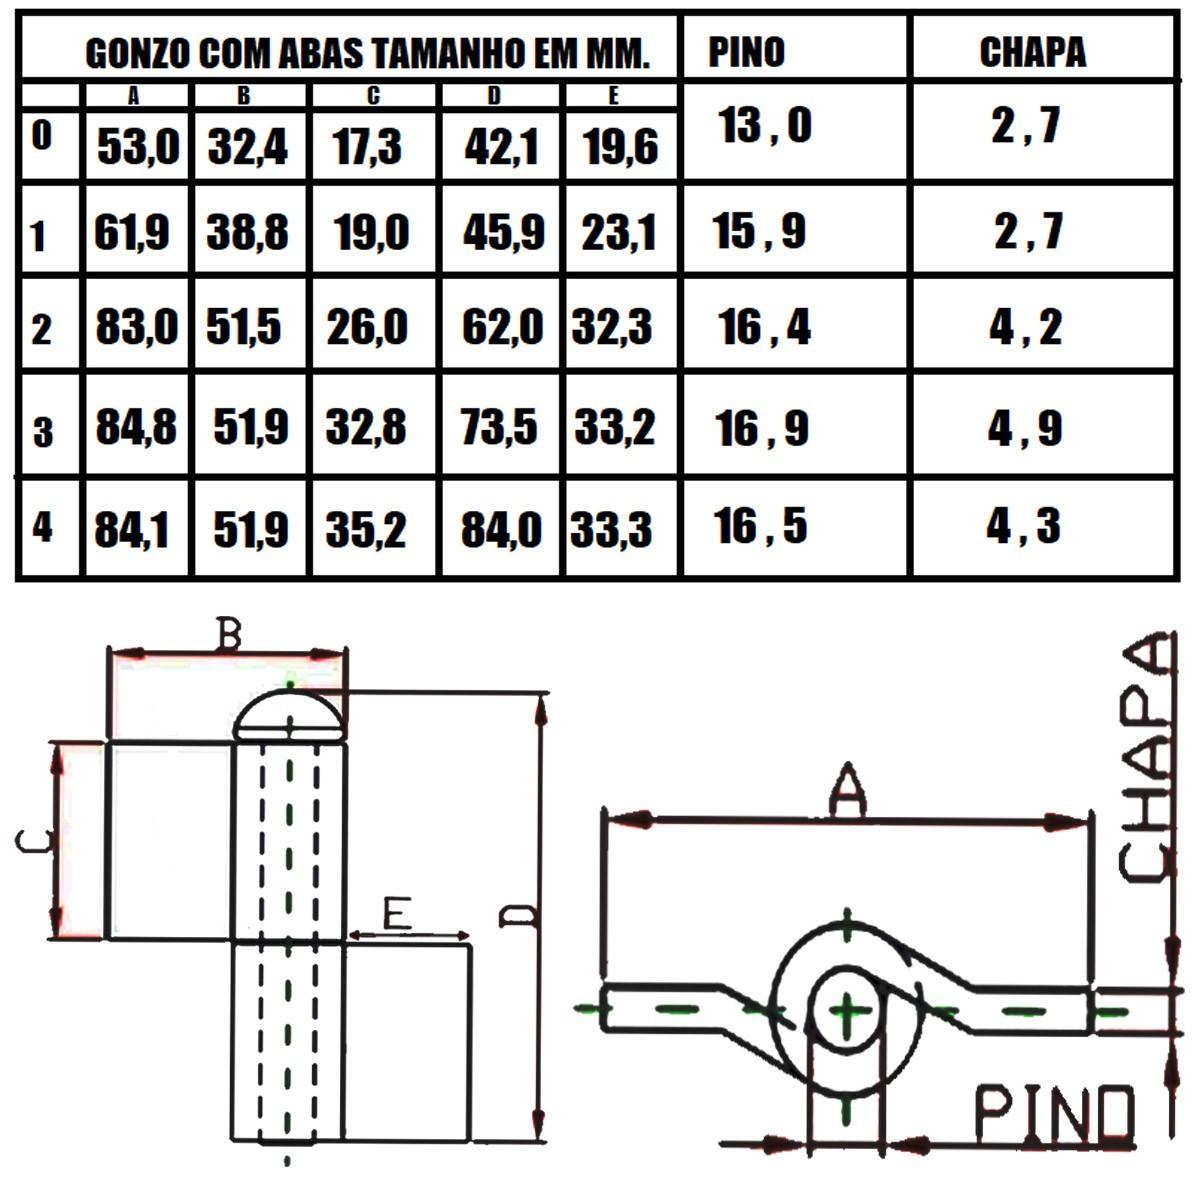 Kit 25un Gonzo Dobradiça Portão C/Aba Nº 2